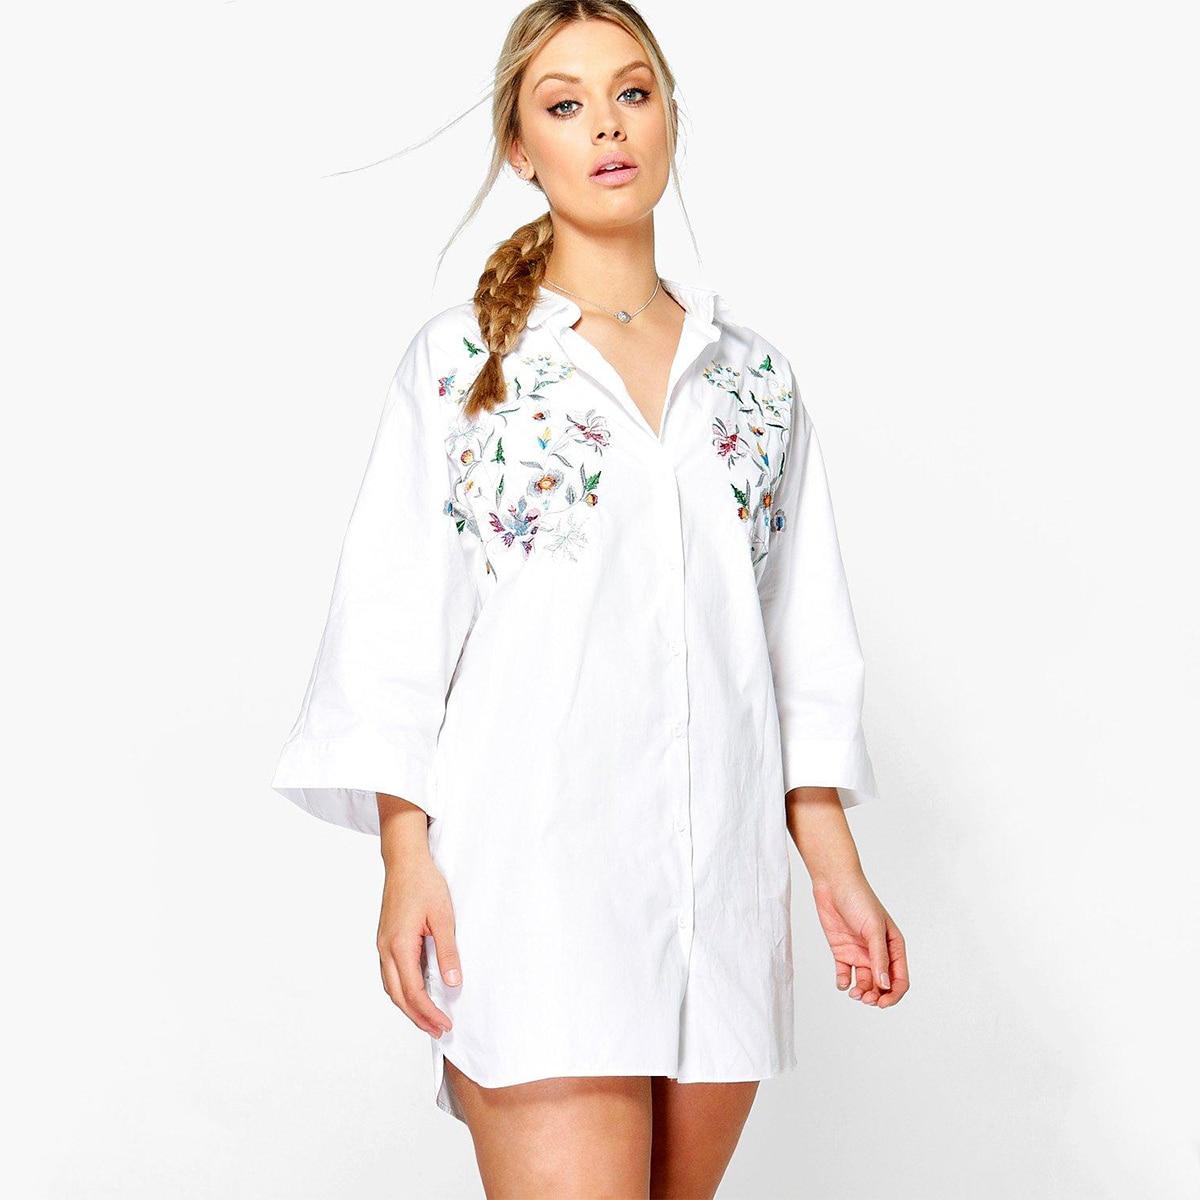 MCO Fashion Floral Emboridered Top Oversized Basic Plus Size Women Clothing Classic Big Kimono Shirt 5xl 6xl 7xl OL Long Blouse 1